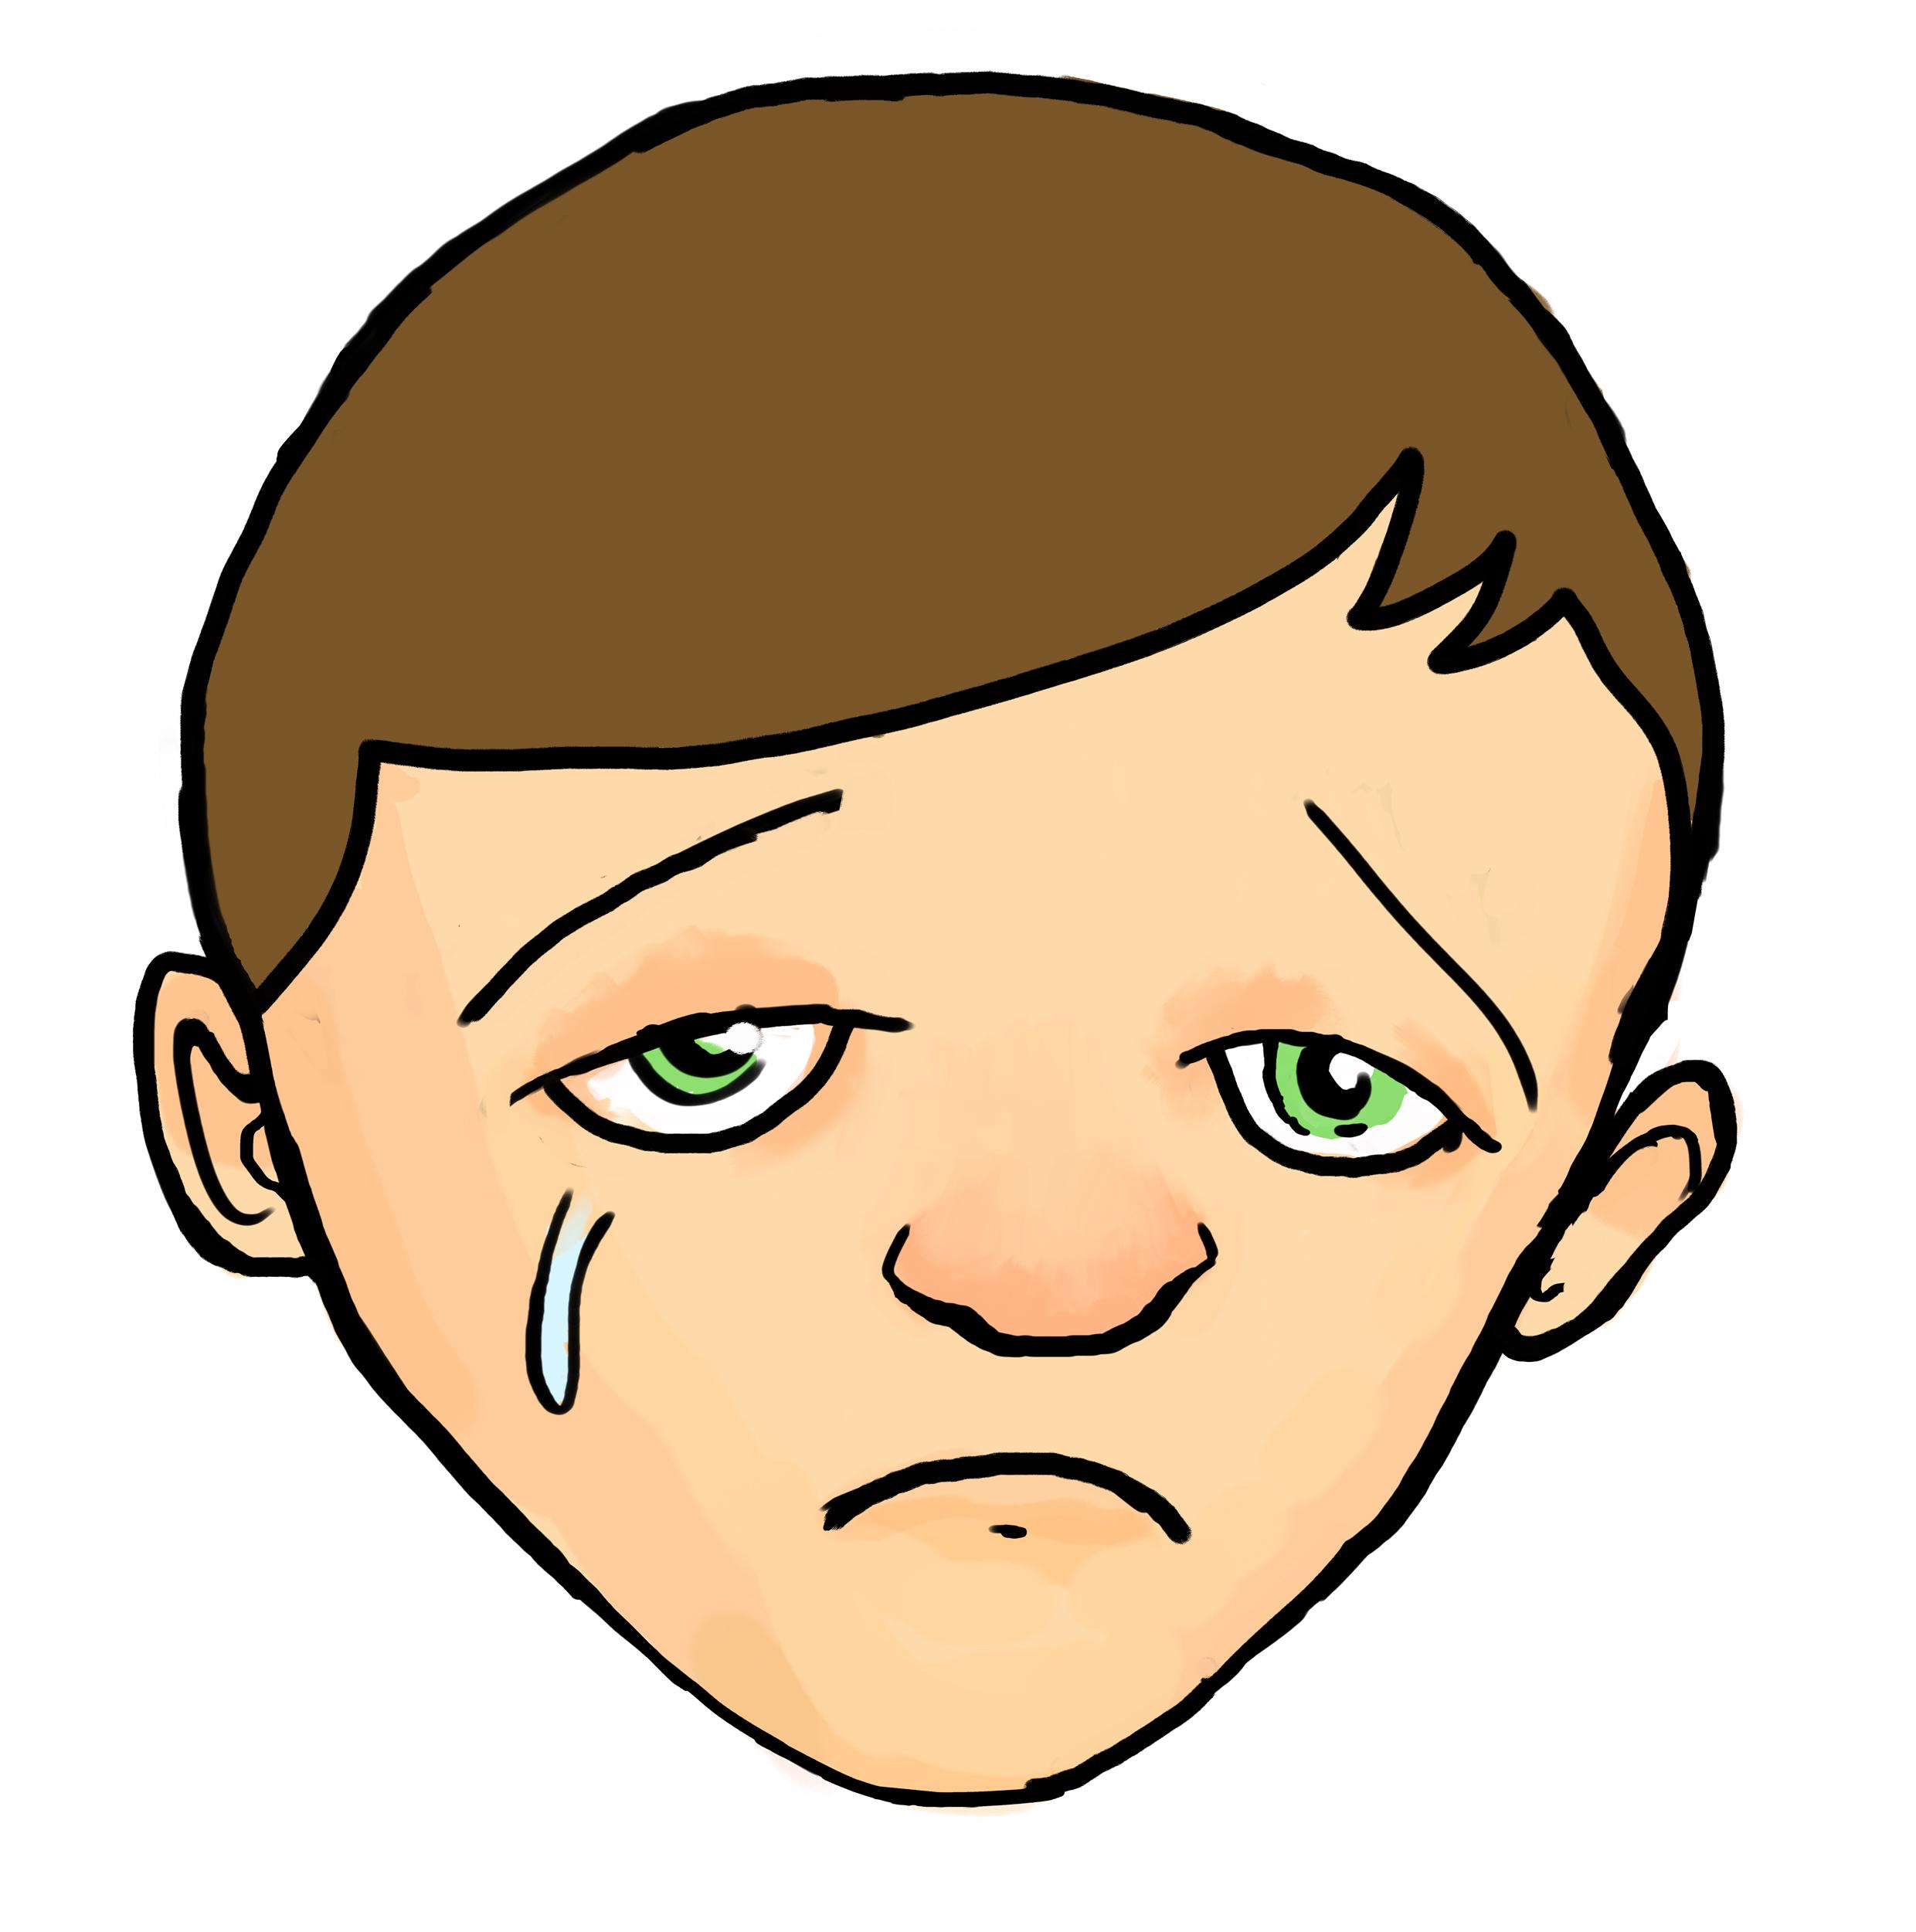 Free Sad People Pics, Download Free Clip Art, Free Clip Art.